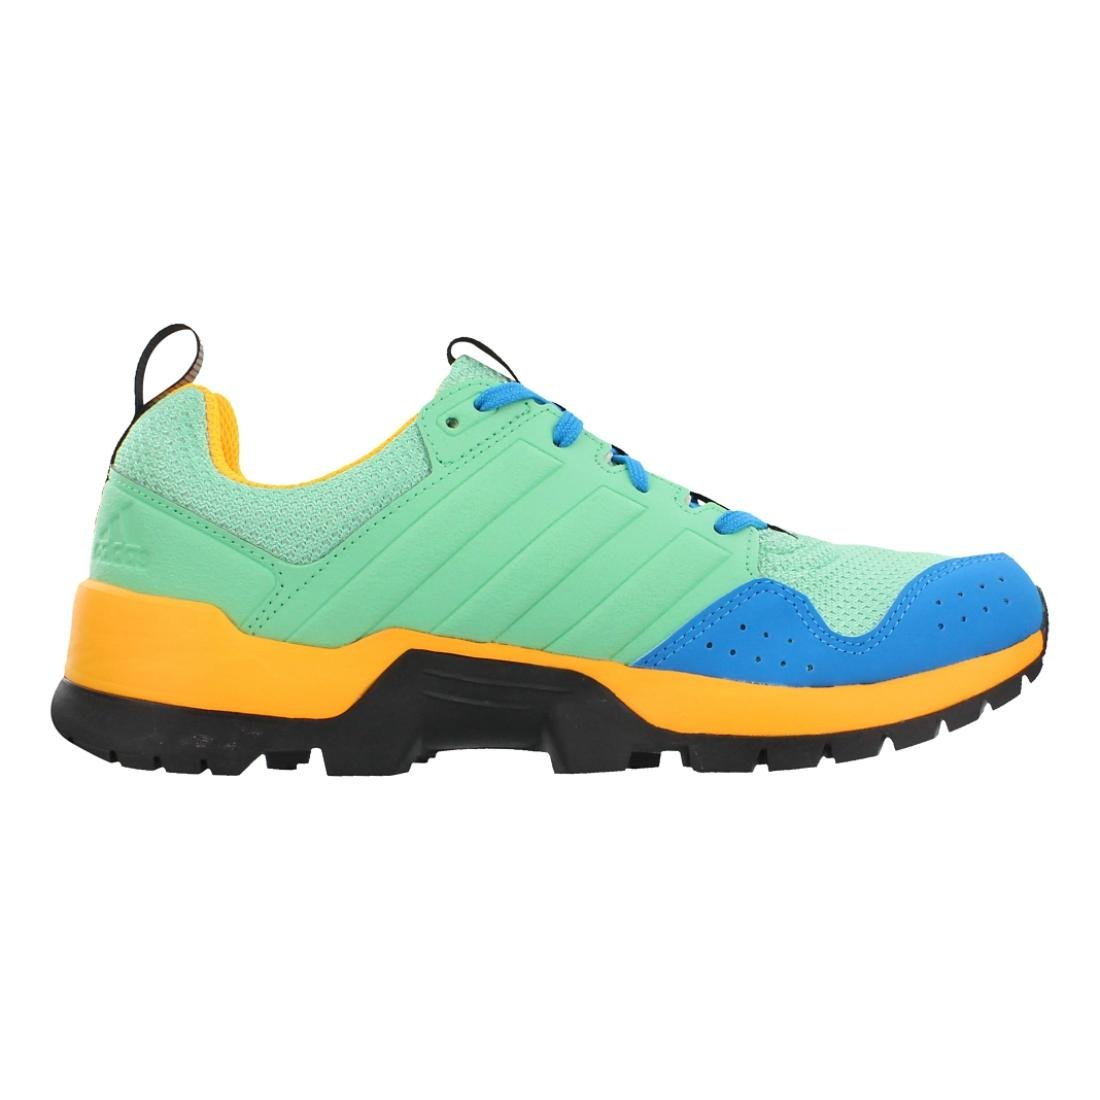 adidas outdoor Women's Gsg9 Trail Running Shoe B0116E7S6M 5.5 B(M) US|Green Glow/Black/Solar Gold